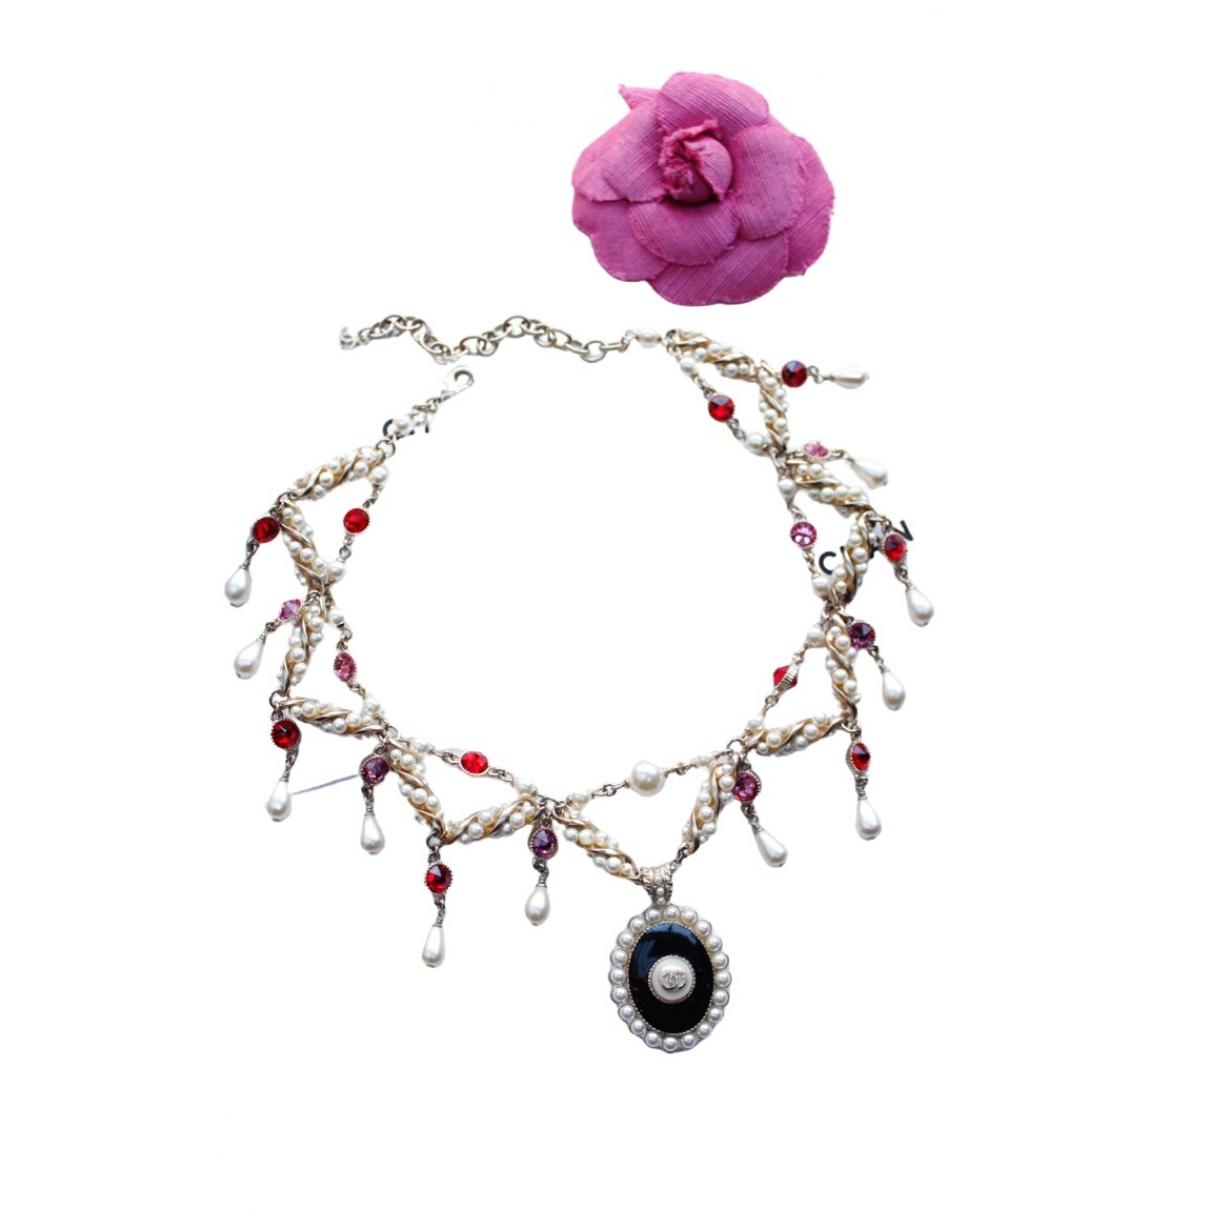 Chanel Baroque Kette Andere